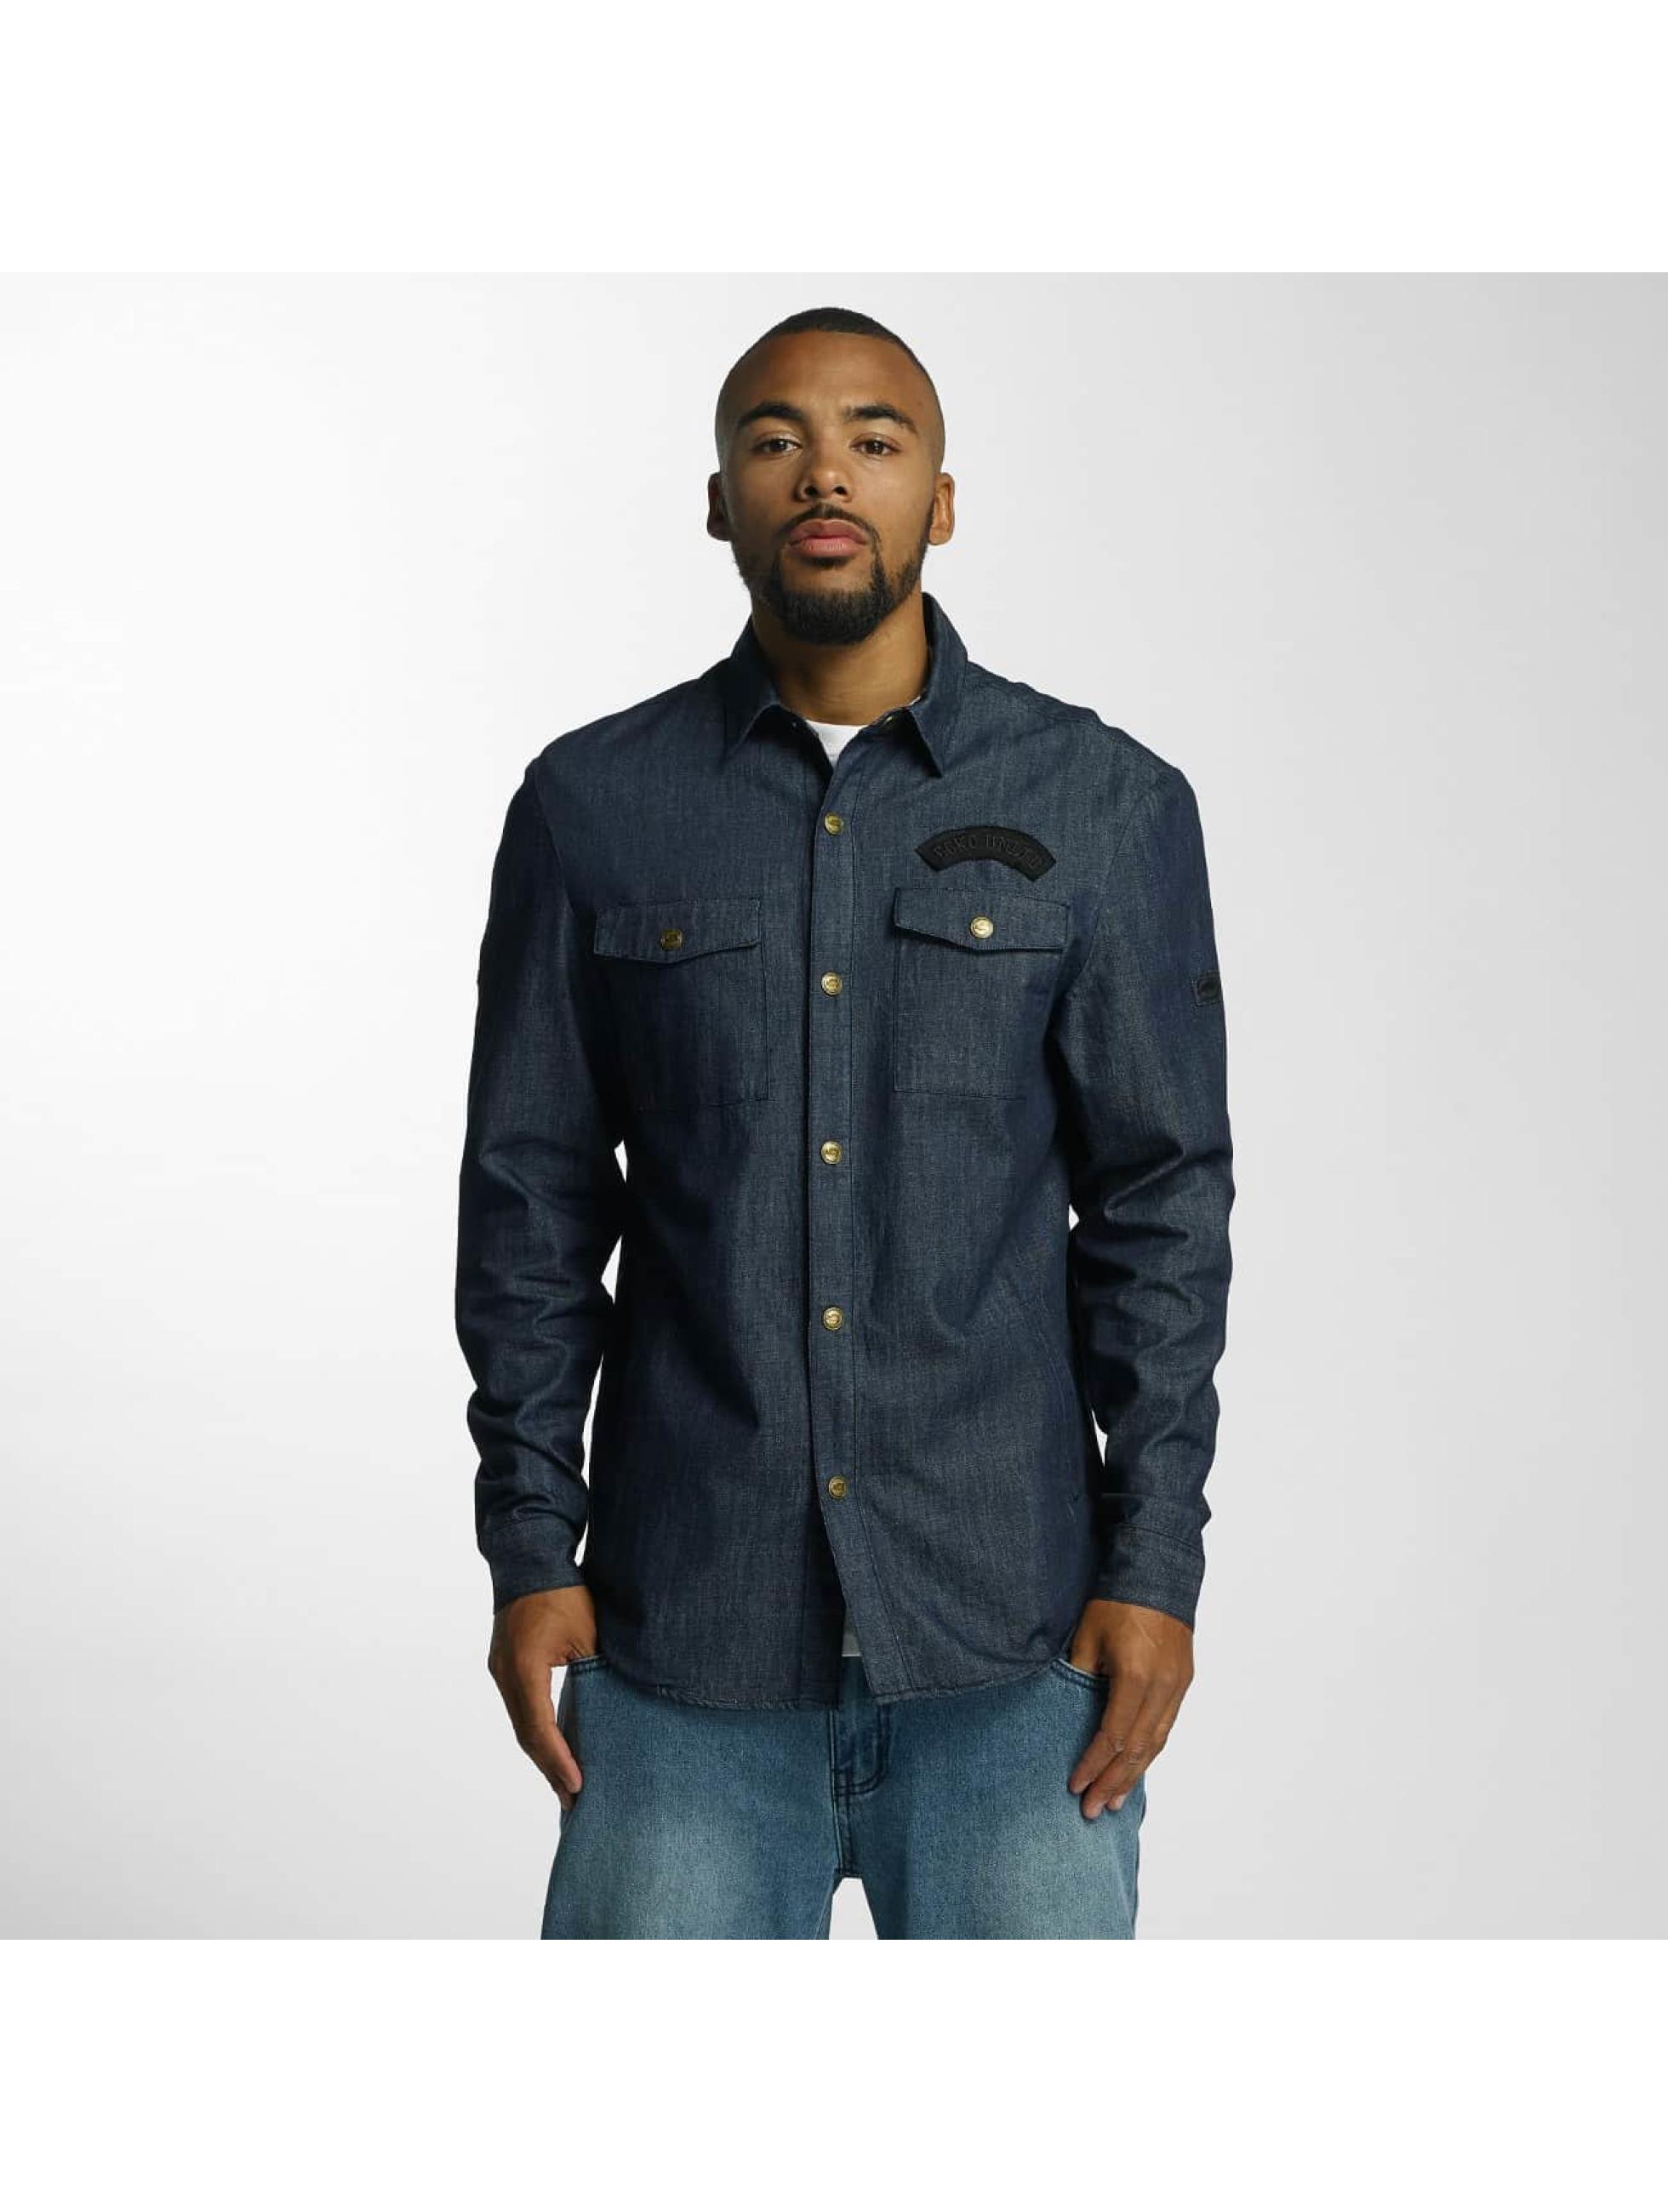 Ecko Unltd. / Shirt Jeans in indigo XL